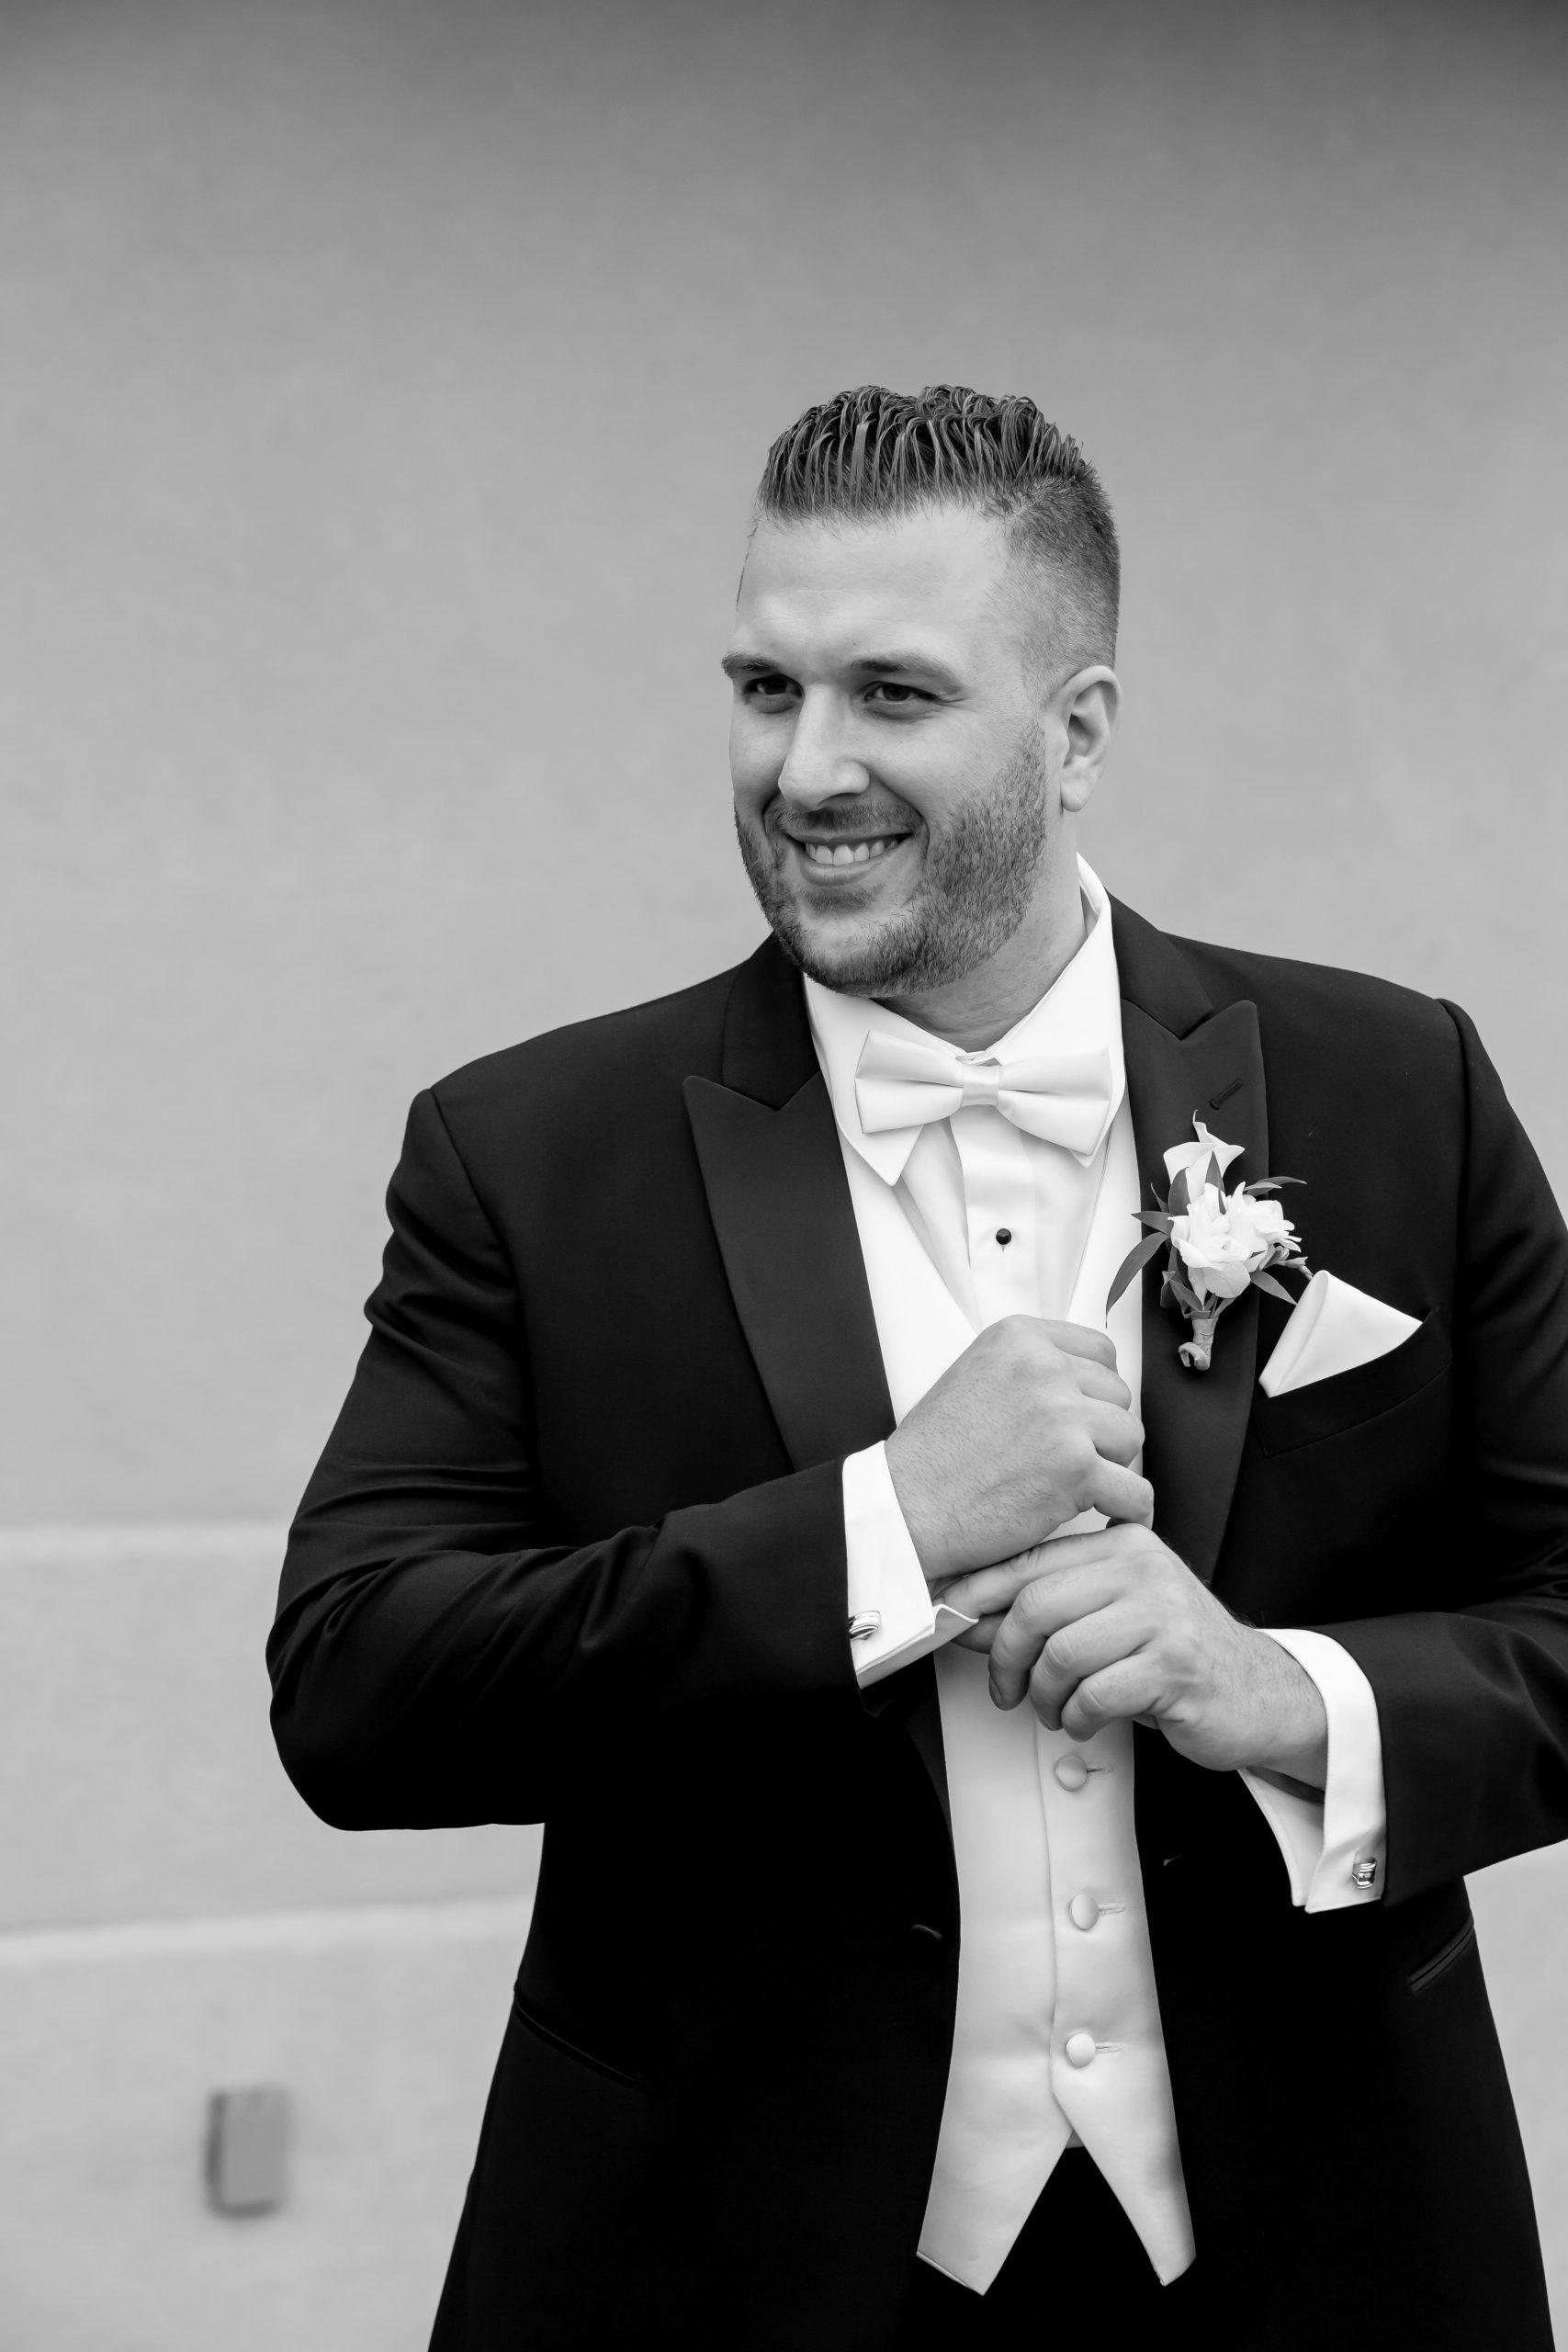 Victori_Rob_Mohawk River Country Club Wedding-17.jpg